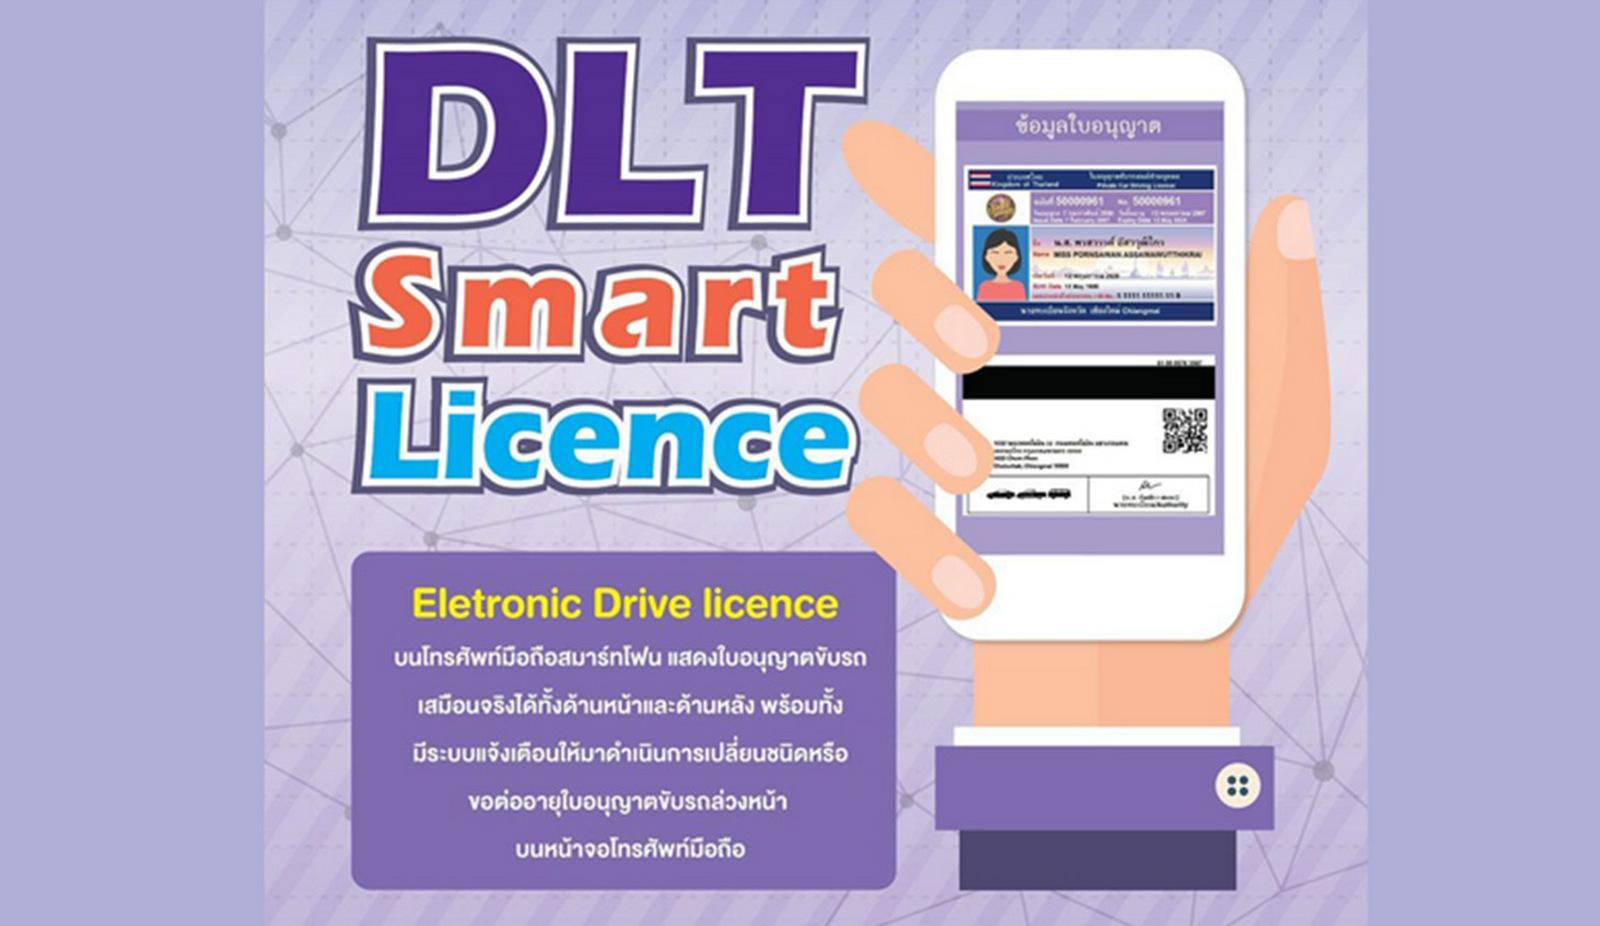 Electronic Driving Licence, ใบอนุญาตขับรถอิเล็กทรอนิกส์